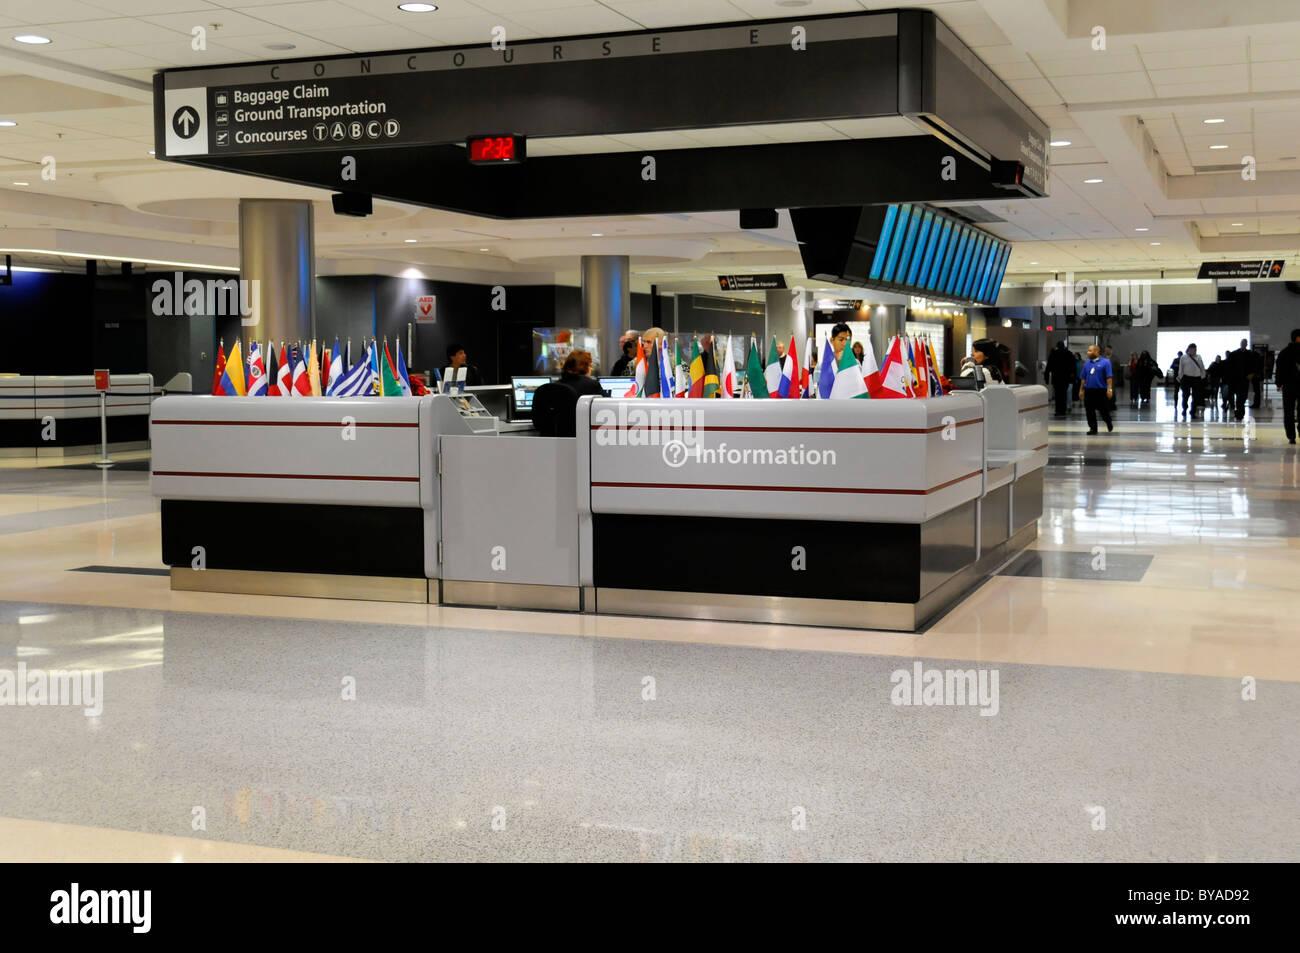 Information desk, Hartsfield-Jackson Atlanta International Airport, Atlanta Airport, Atlanta, USA, North America - Stock Image